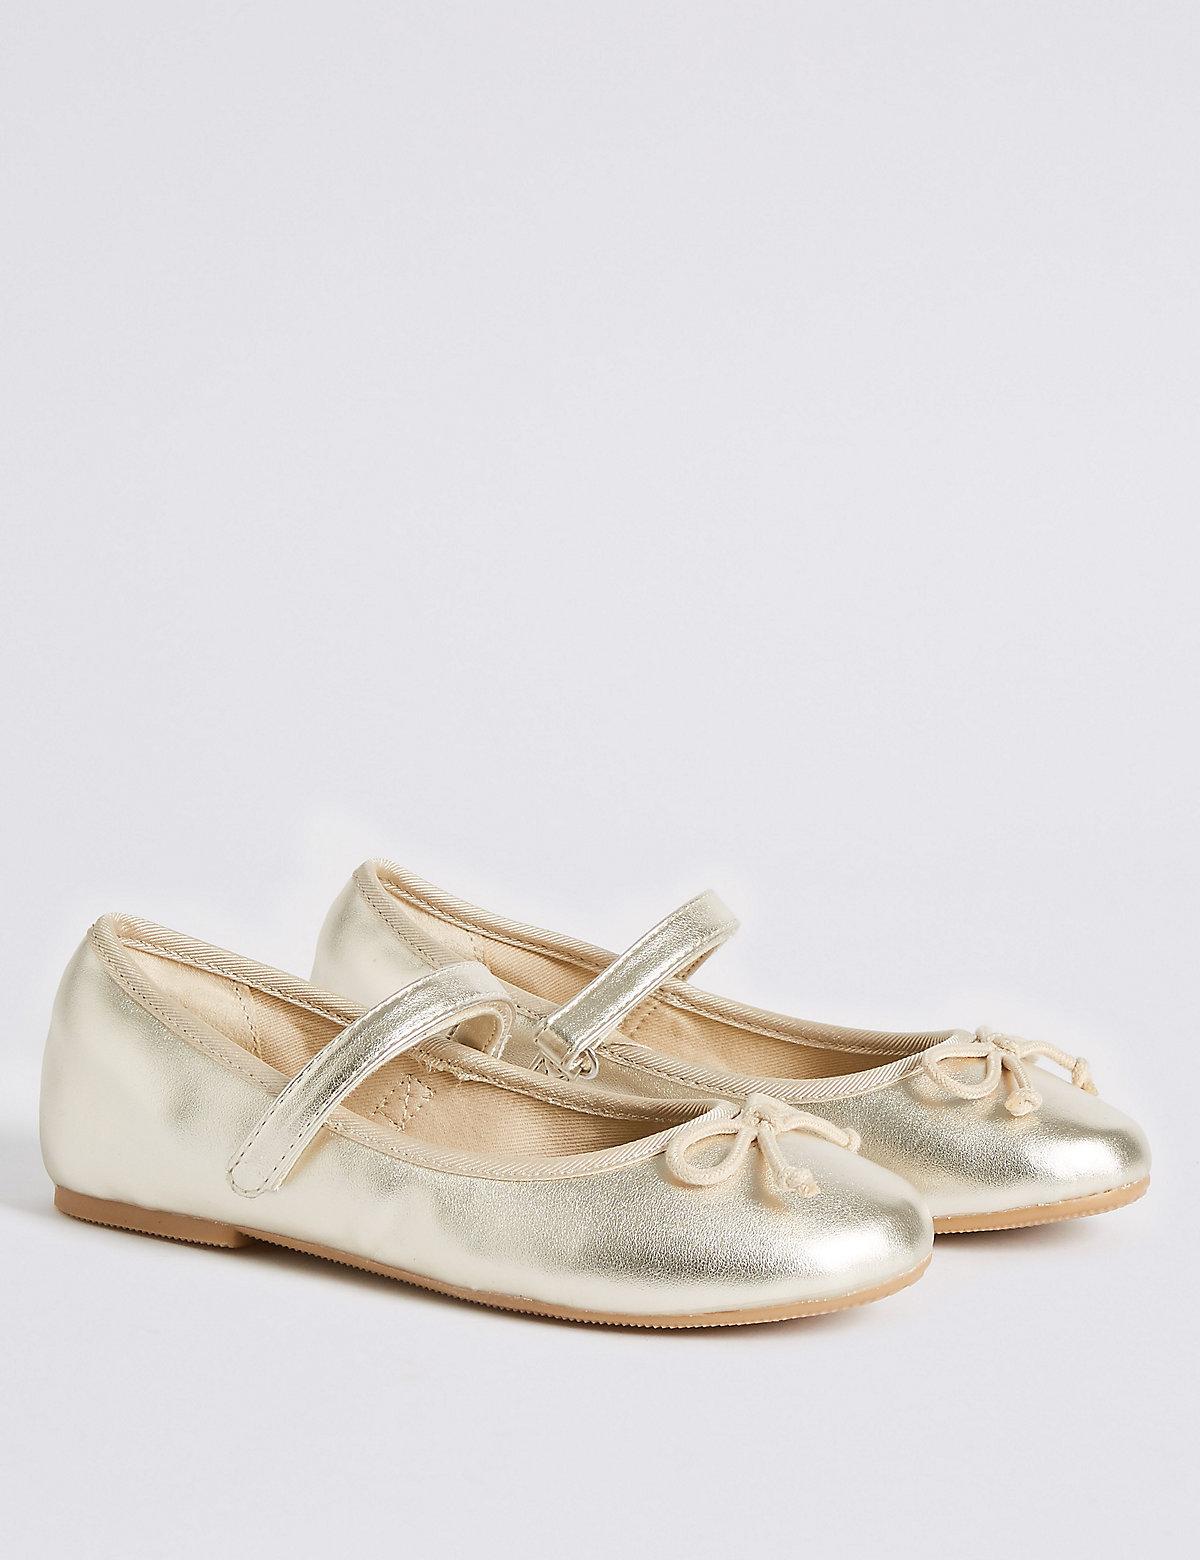 Kids' Ballerina Shoes